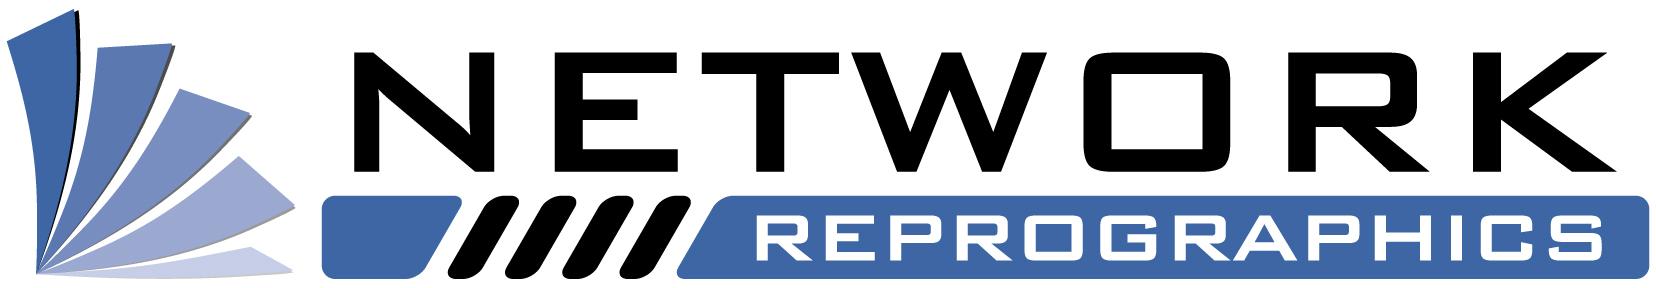 Network Reprograhics